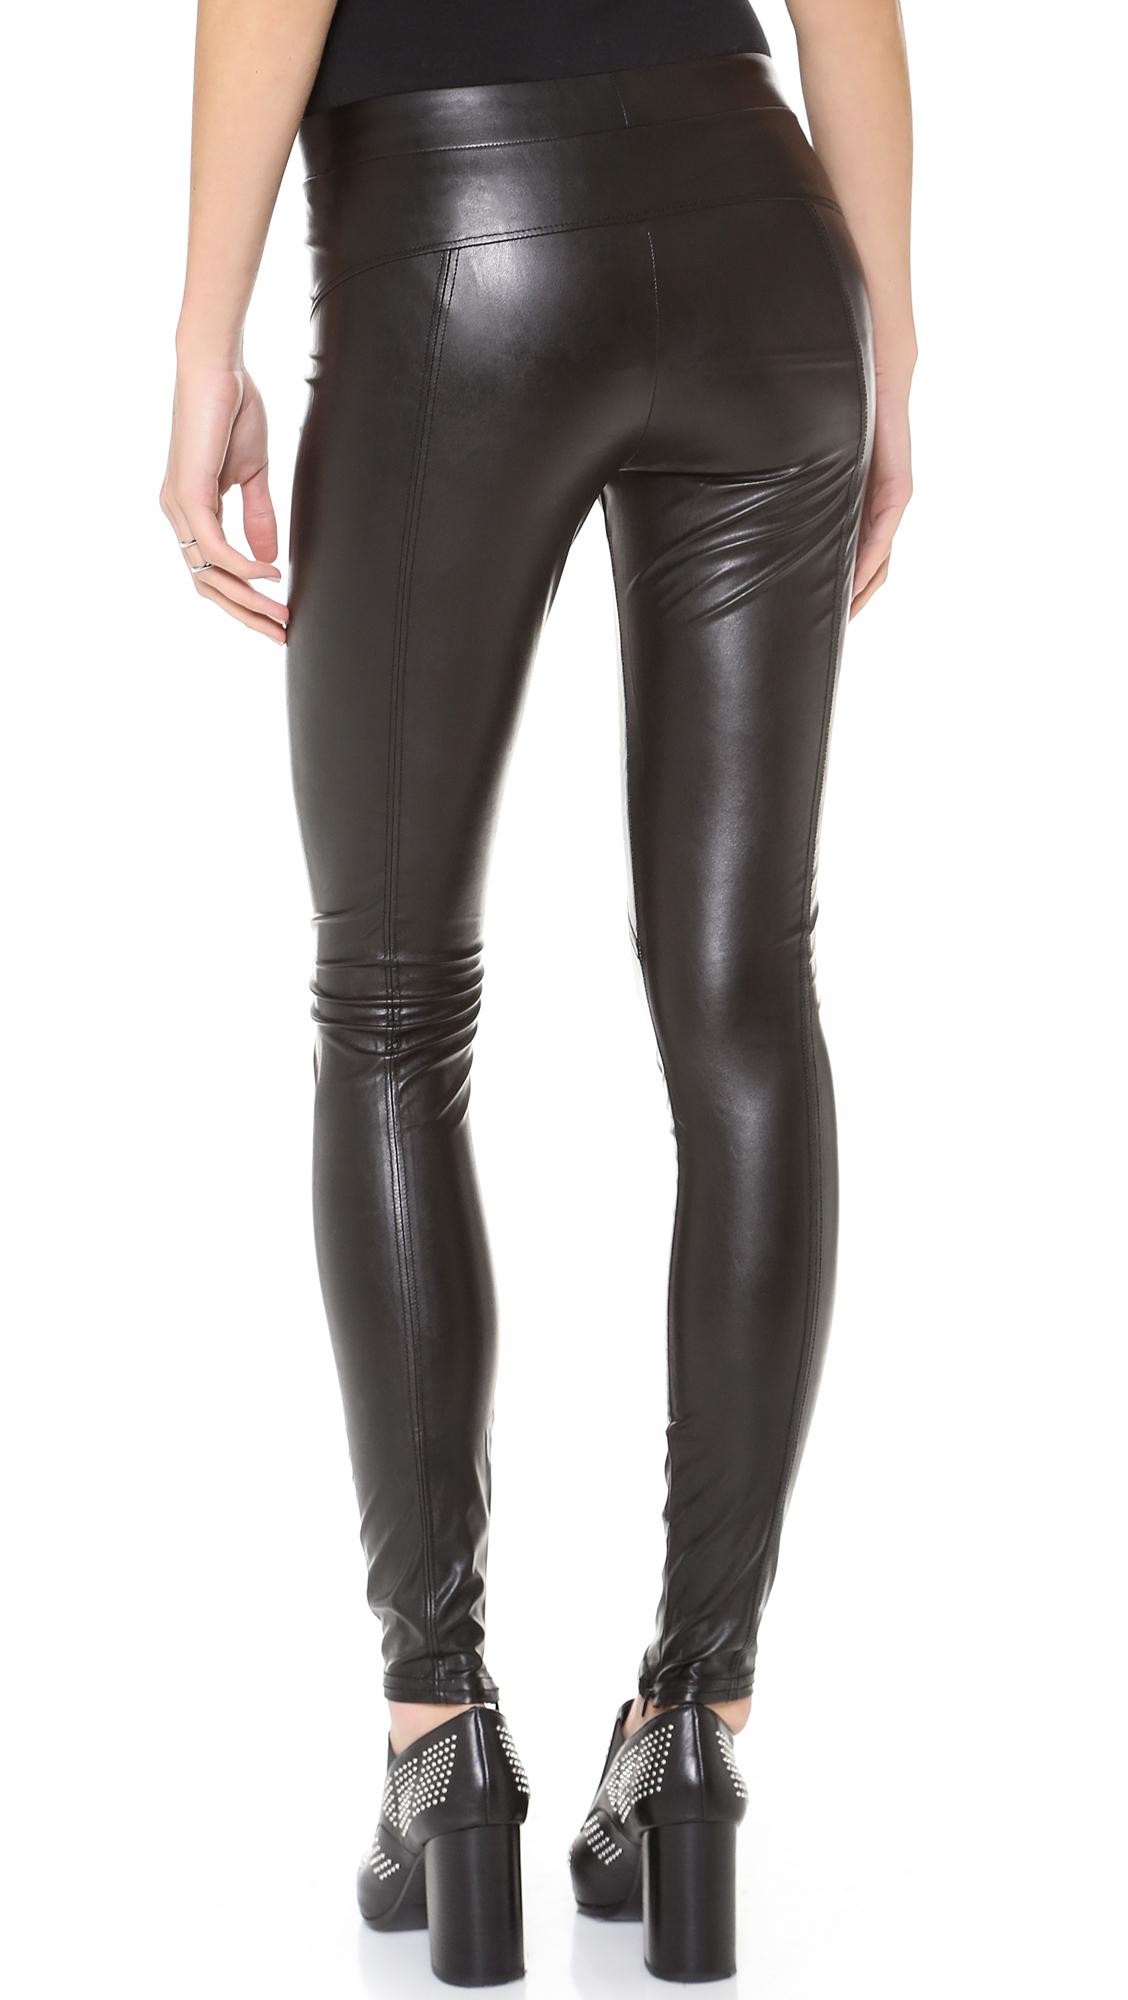 bc82a59137bcc David Lerner Faux Leather Leggings | SHOPBOP